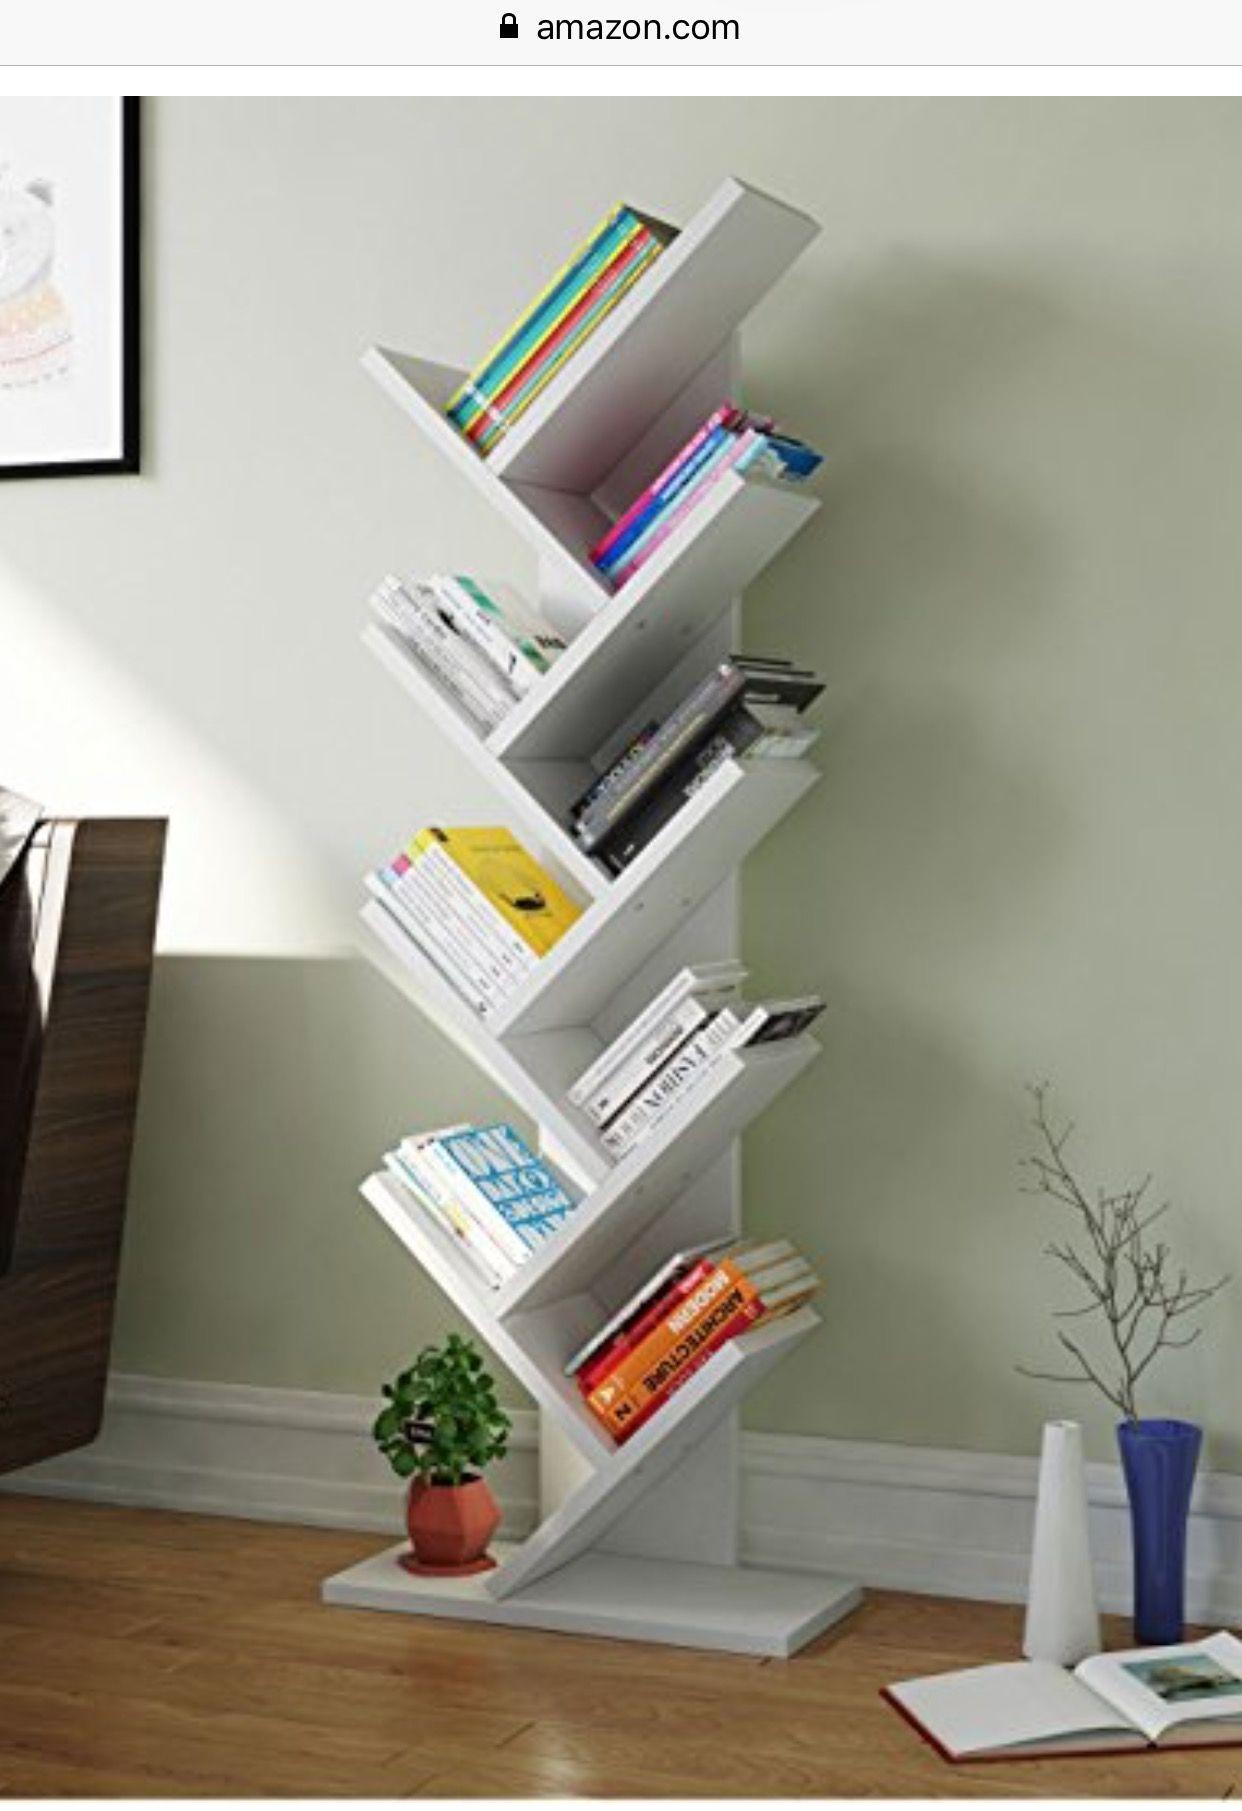 Pin By Cedana Radisevic On Good Idea Bookshelf Design Home